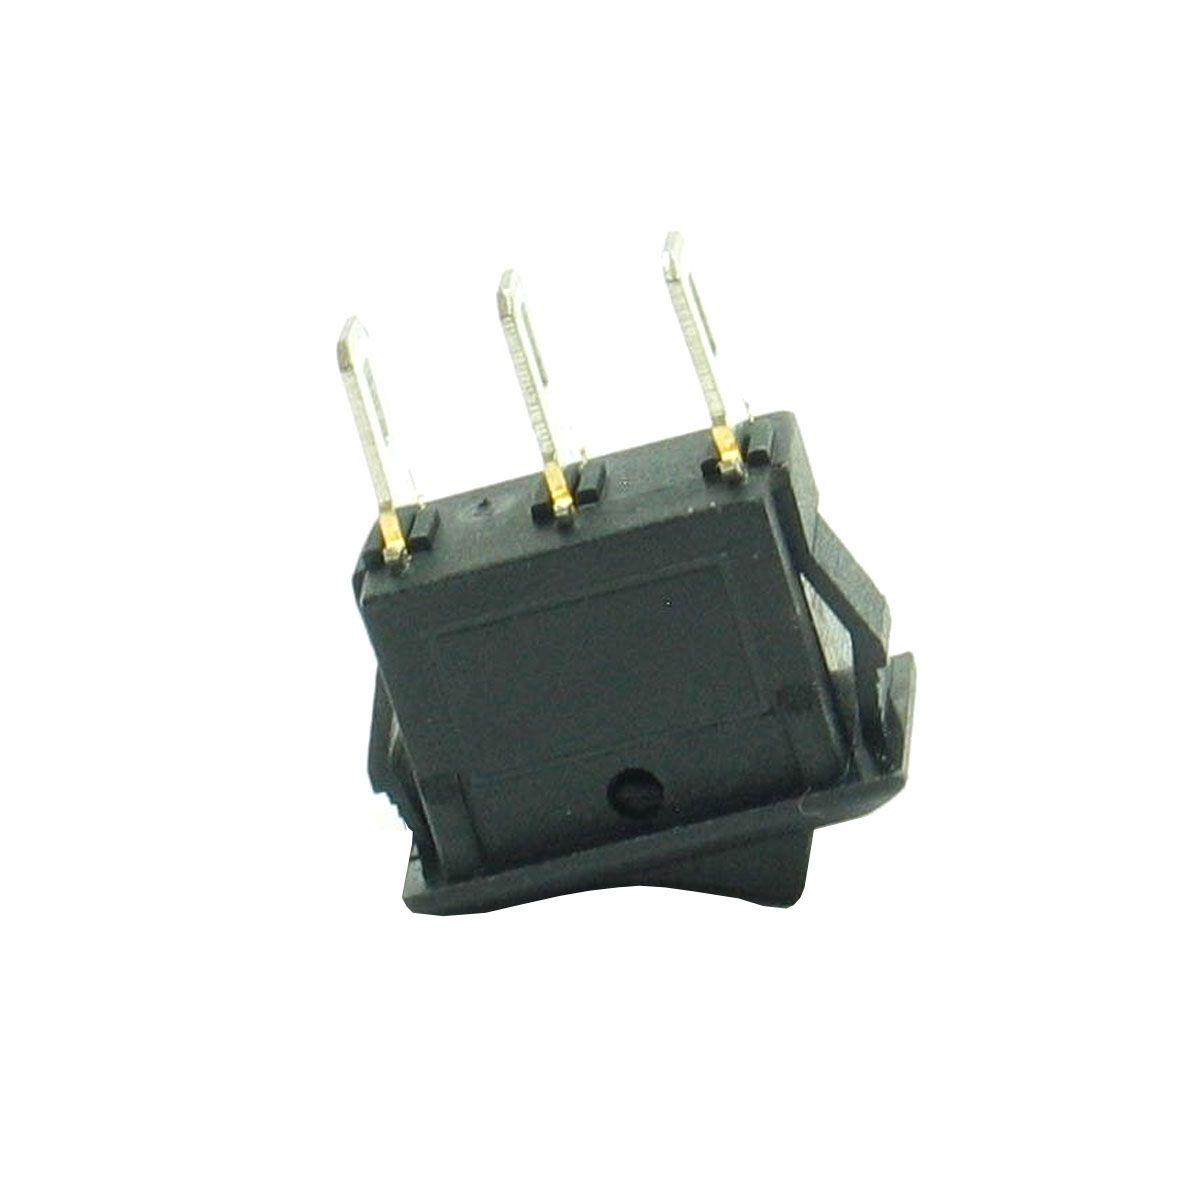 3x Mini Chave Gangorra KCD11-102 3 Terminais 2 Posições - Cor Preta